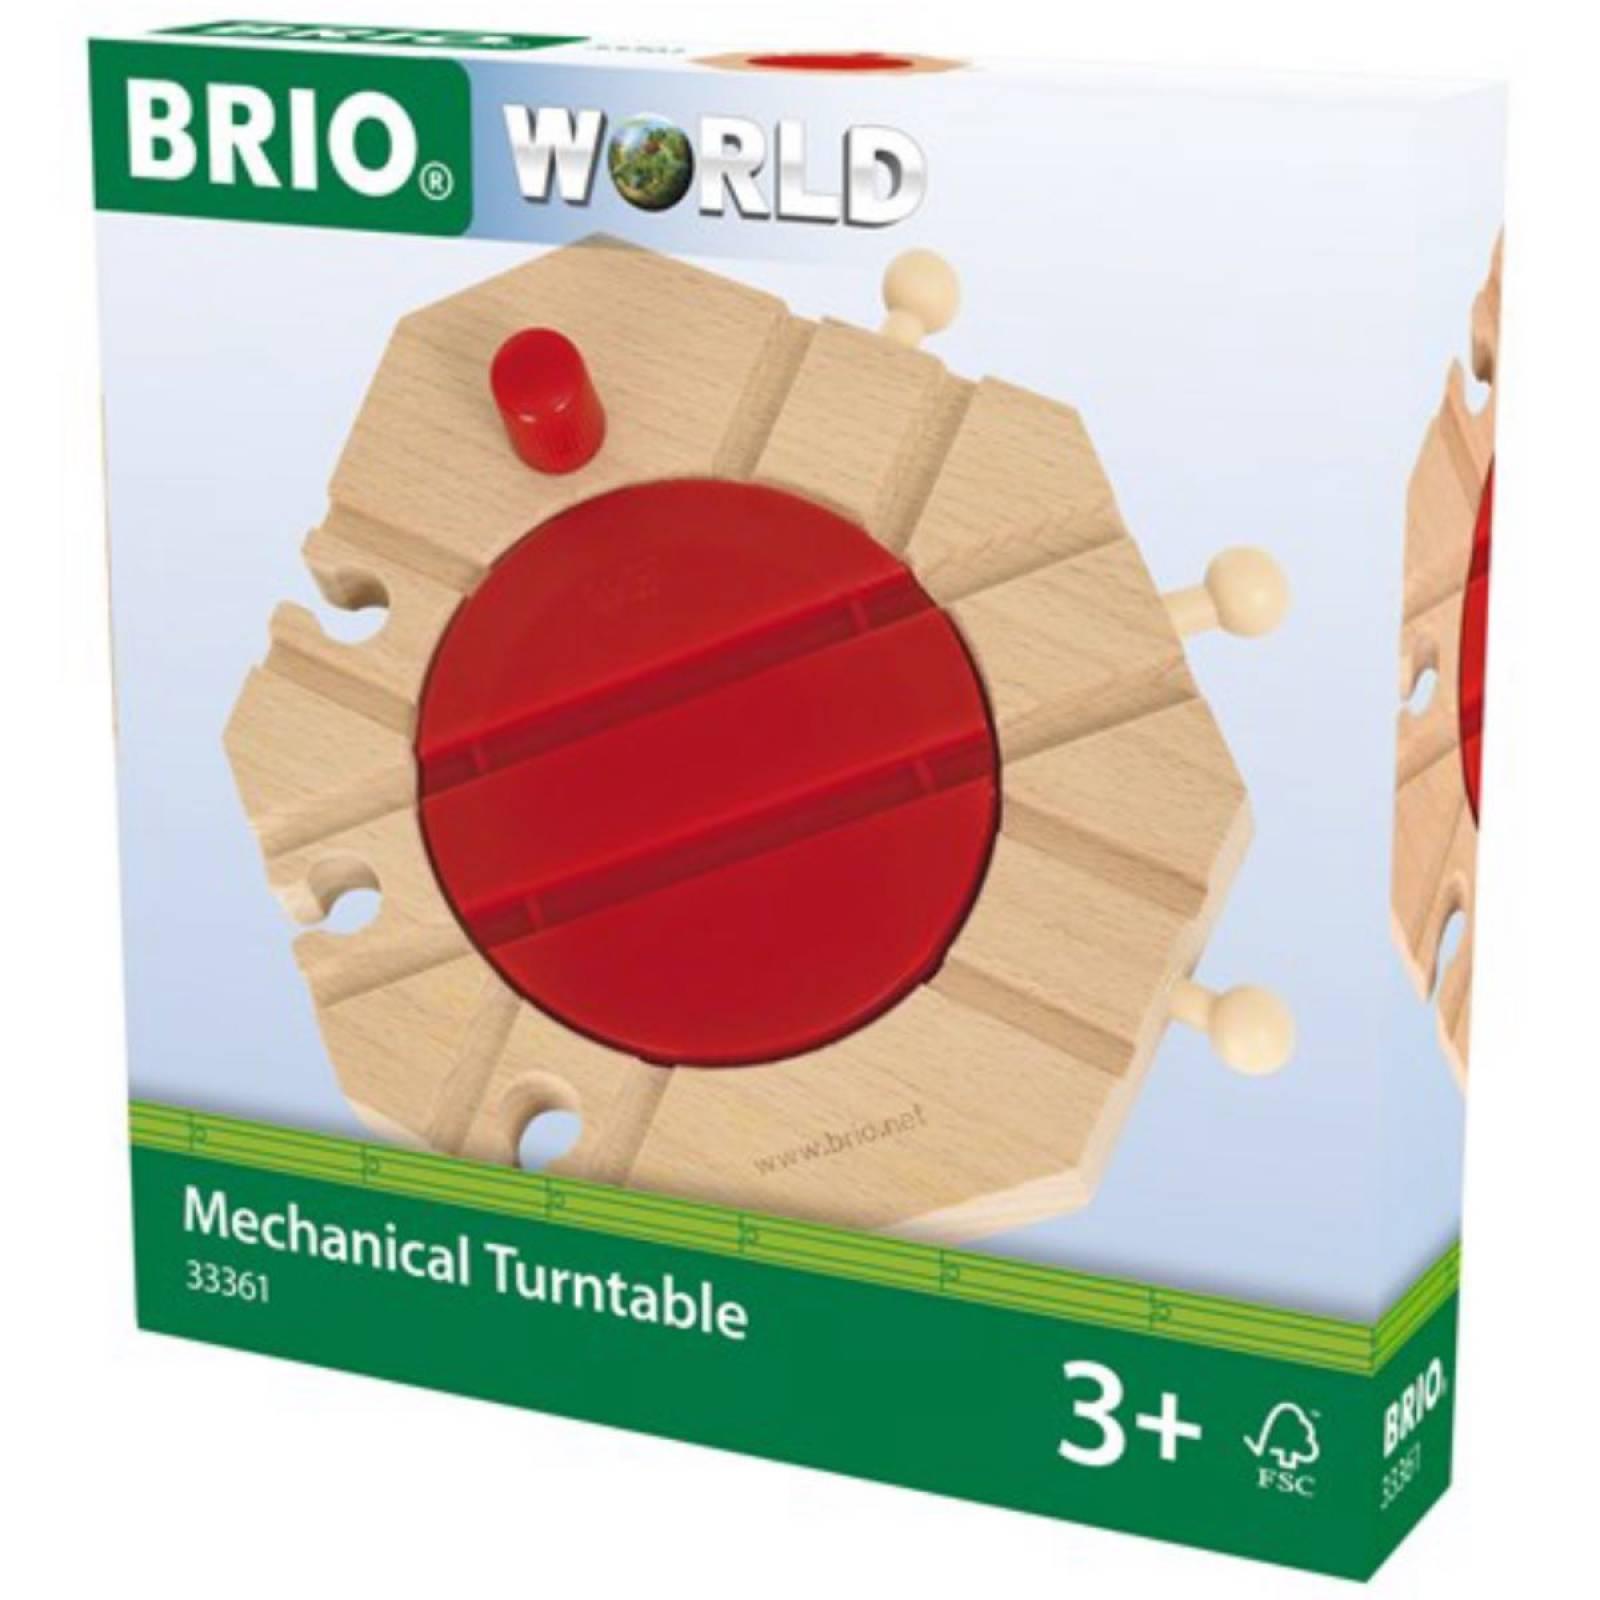 Mechanical Turntable BRIO Wooden Railway